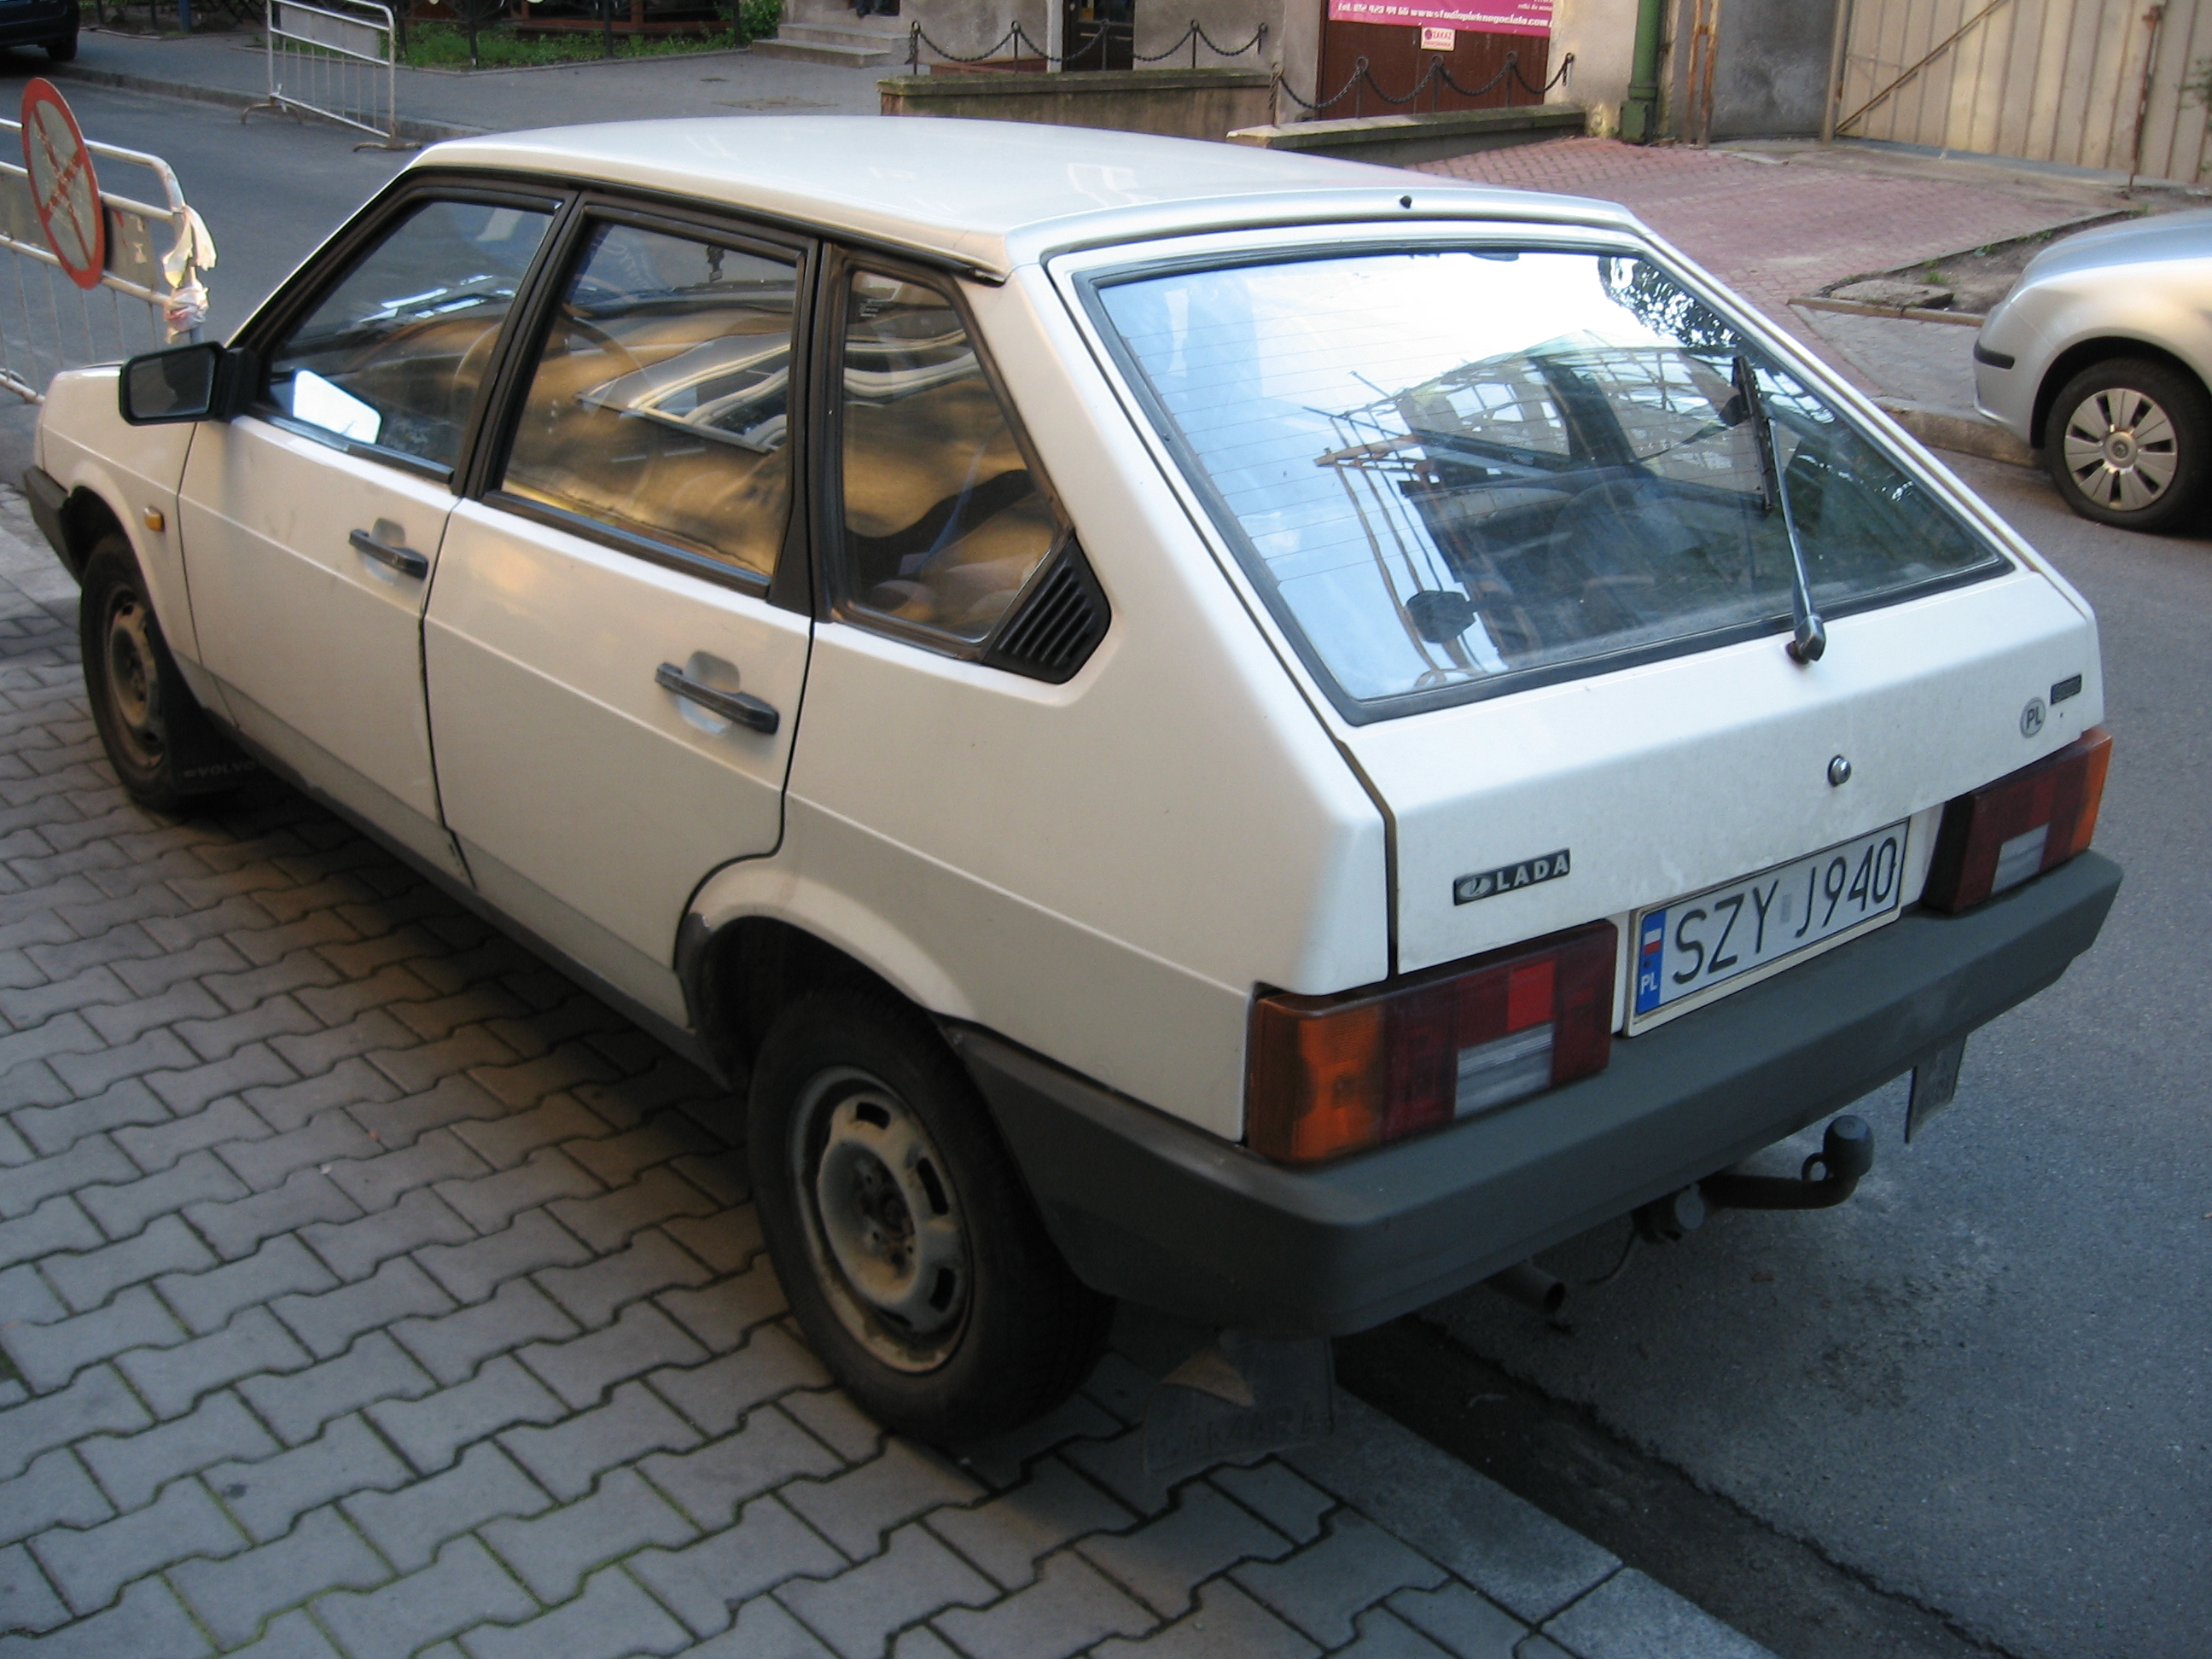 File:Lada Samara 2109 in Kraków (1).jpg